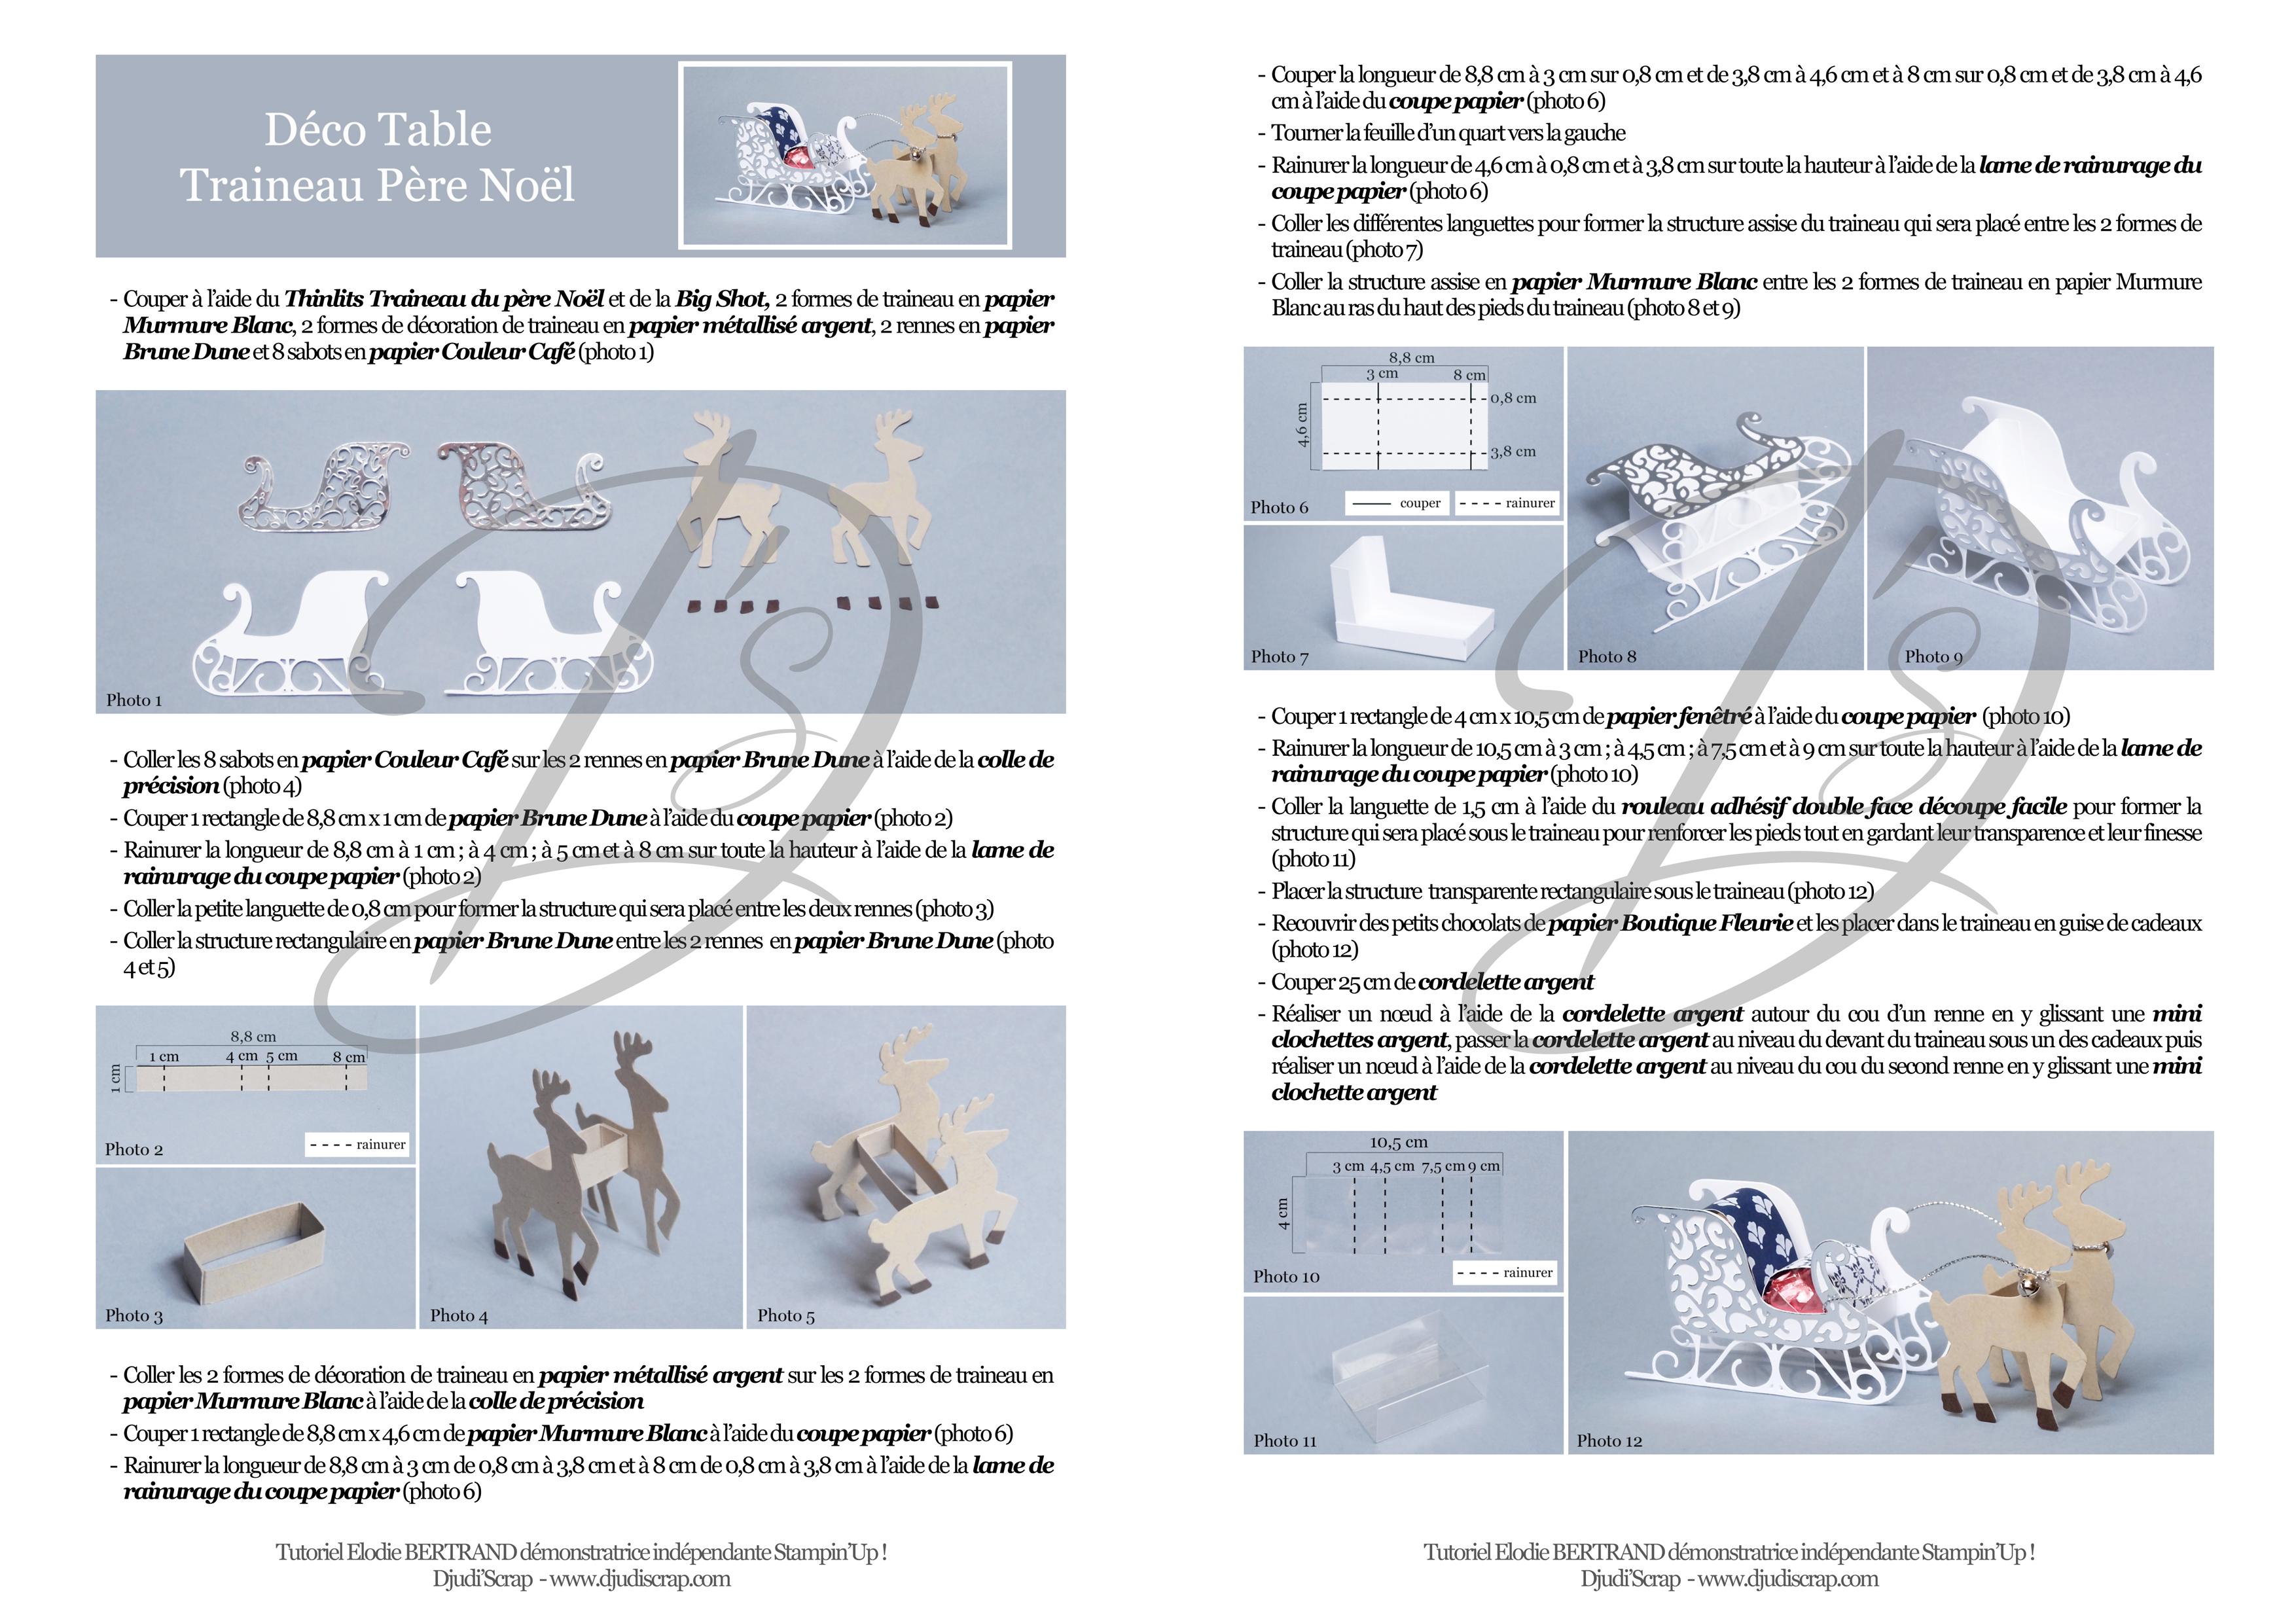 tutoriel-djudiscrap-deco-table-traineau-du-pere-noel